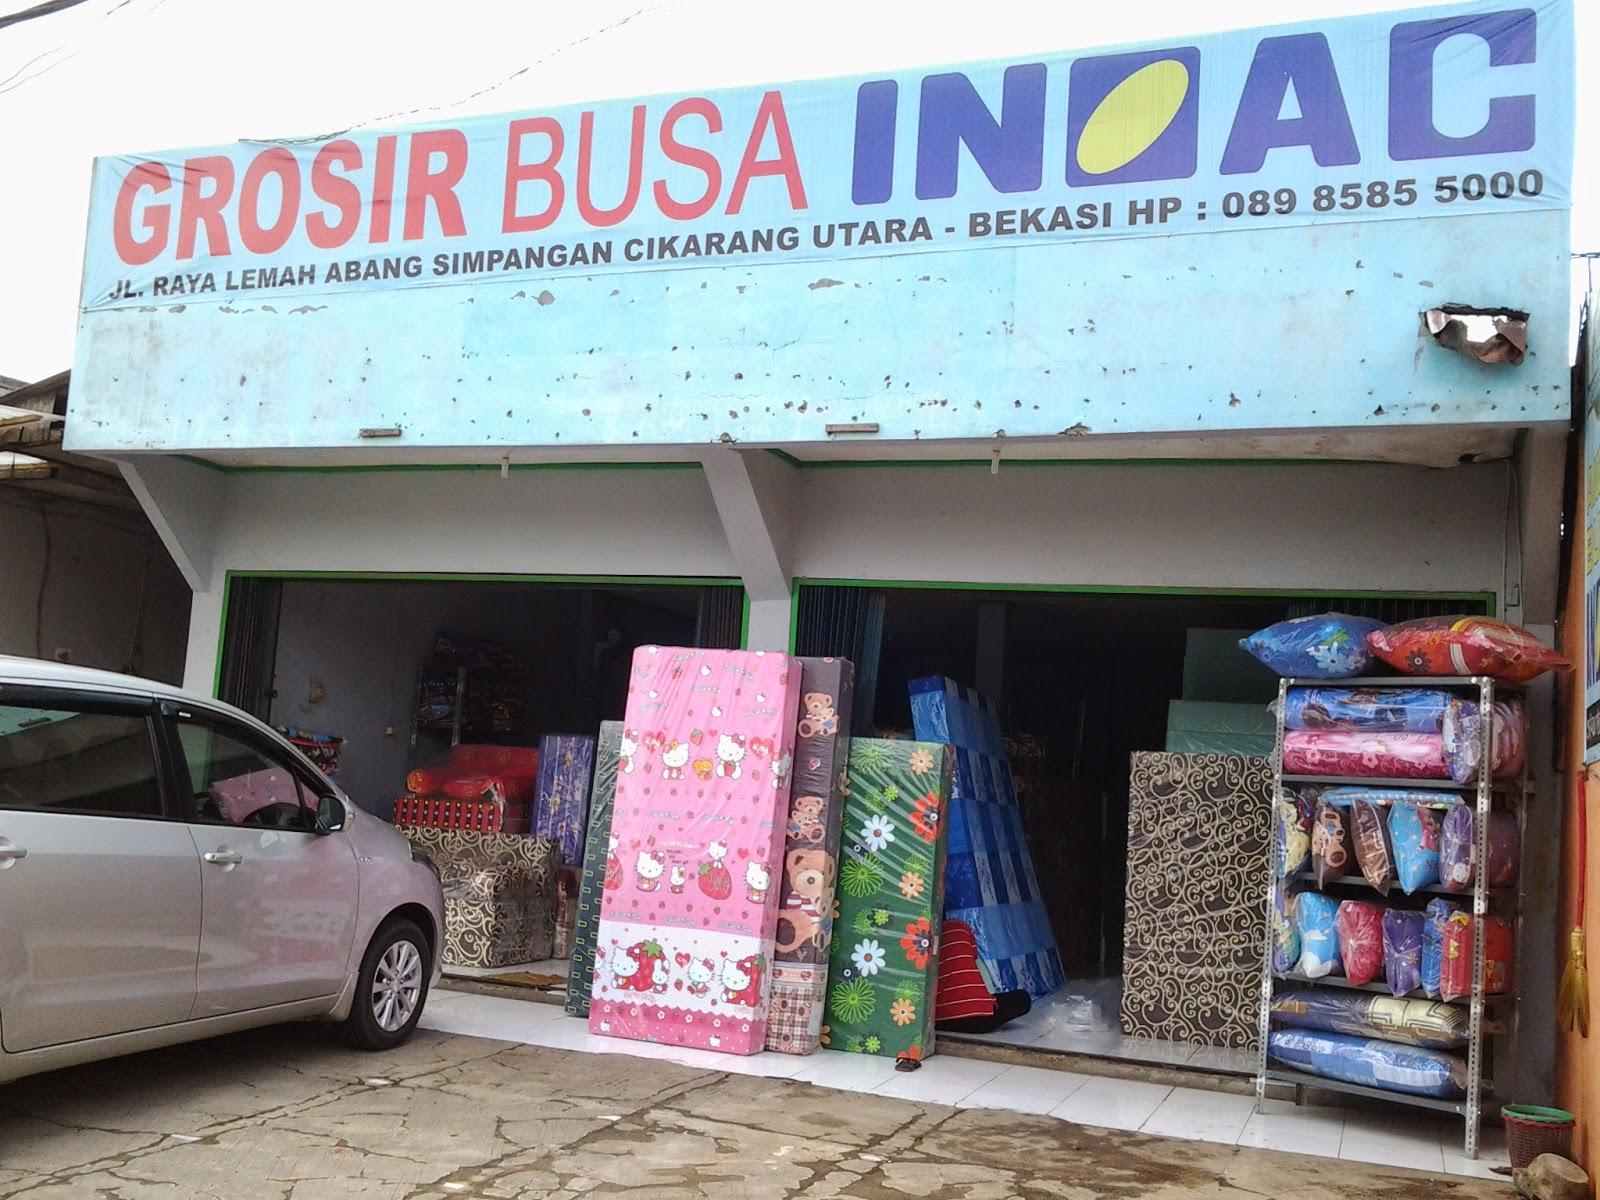 Harga Sofa Bed Inoac Cikarang Olx Bangalore Kasur Busa Bekasi Aneka Produk Foam